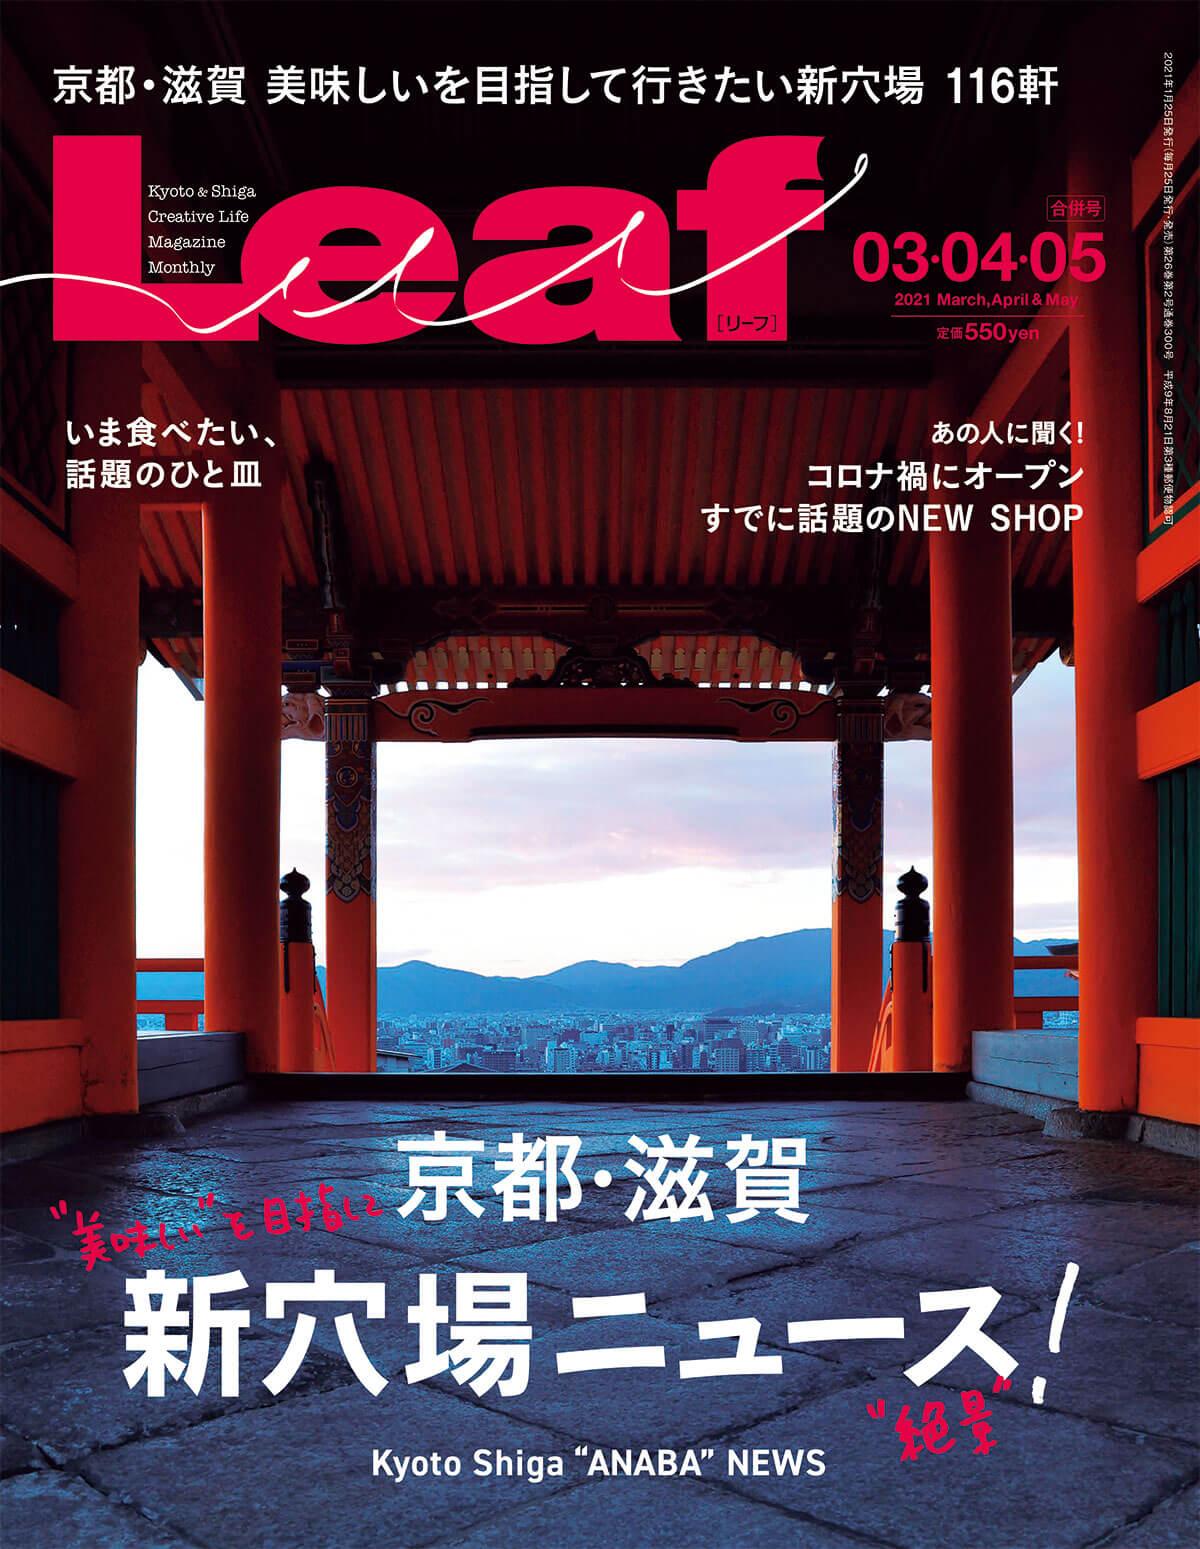 Leaf - 京都・滋賀新穴場ニュース!